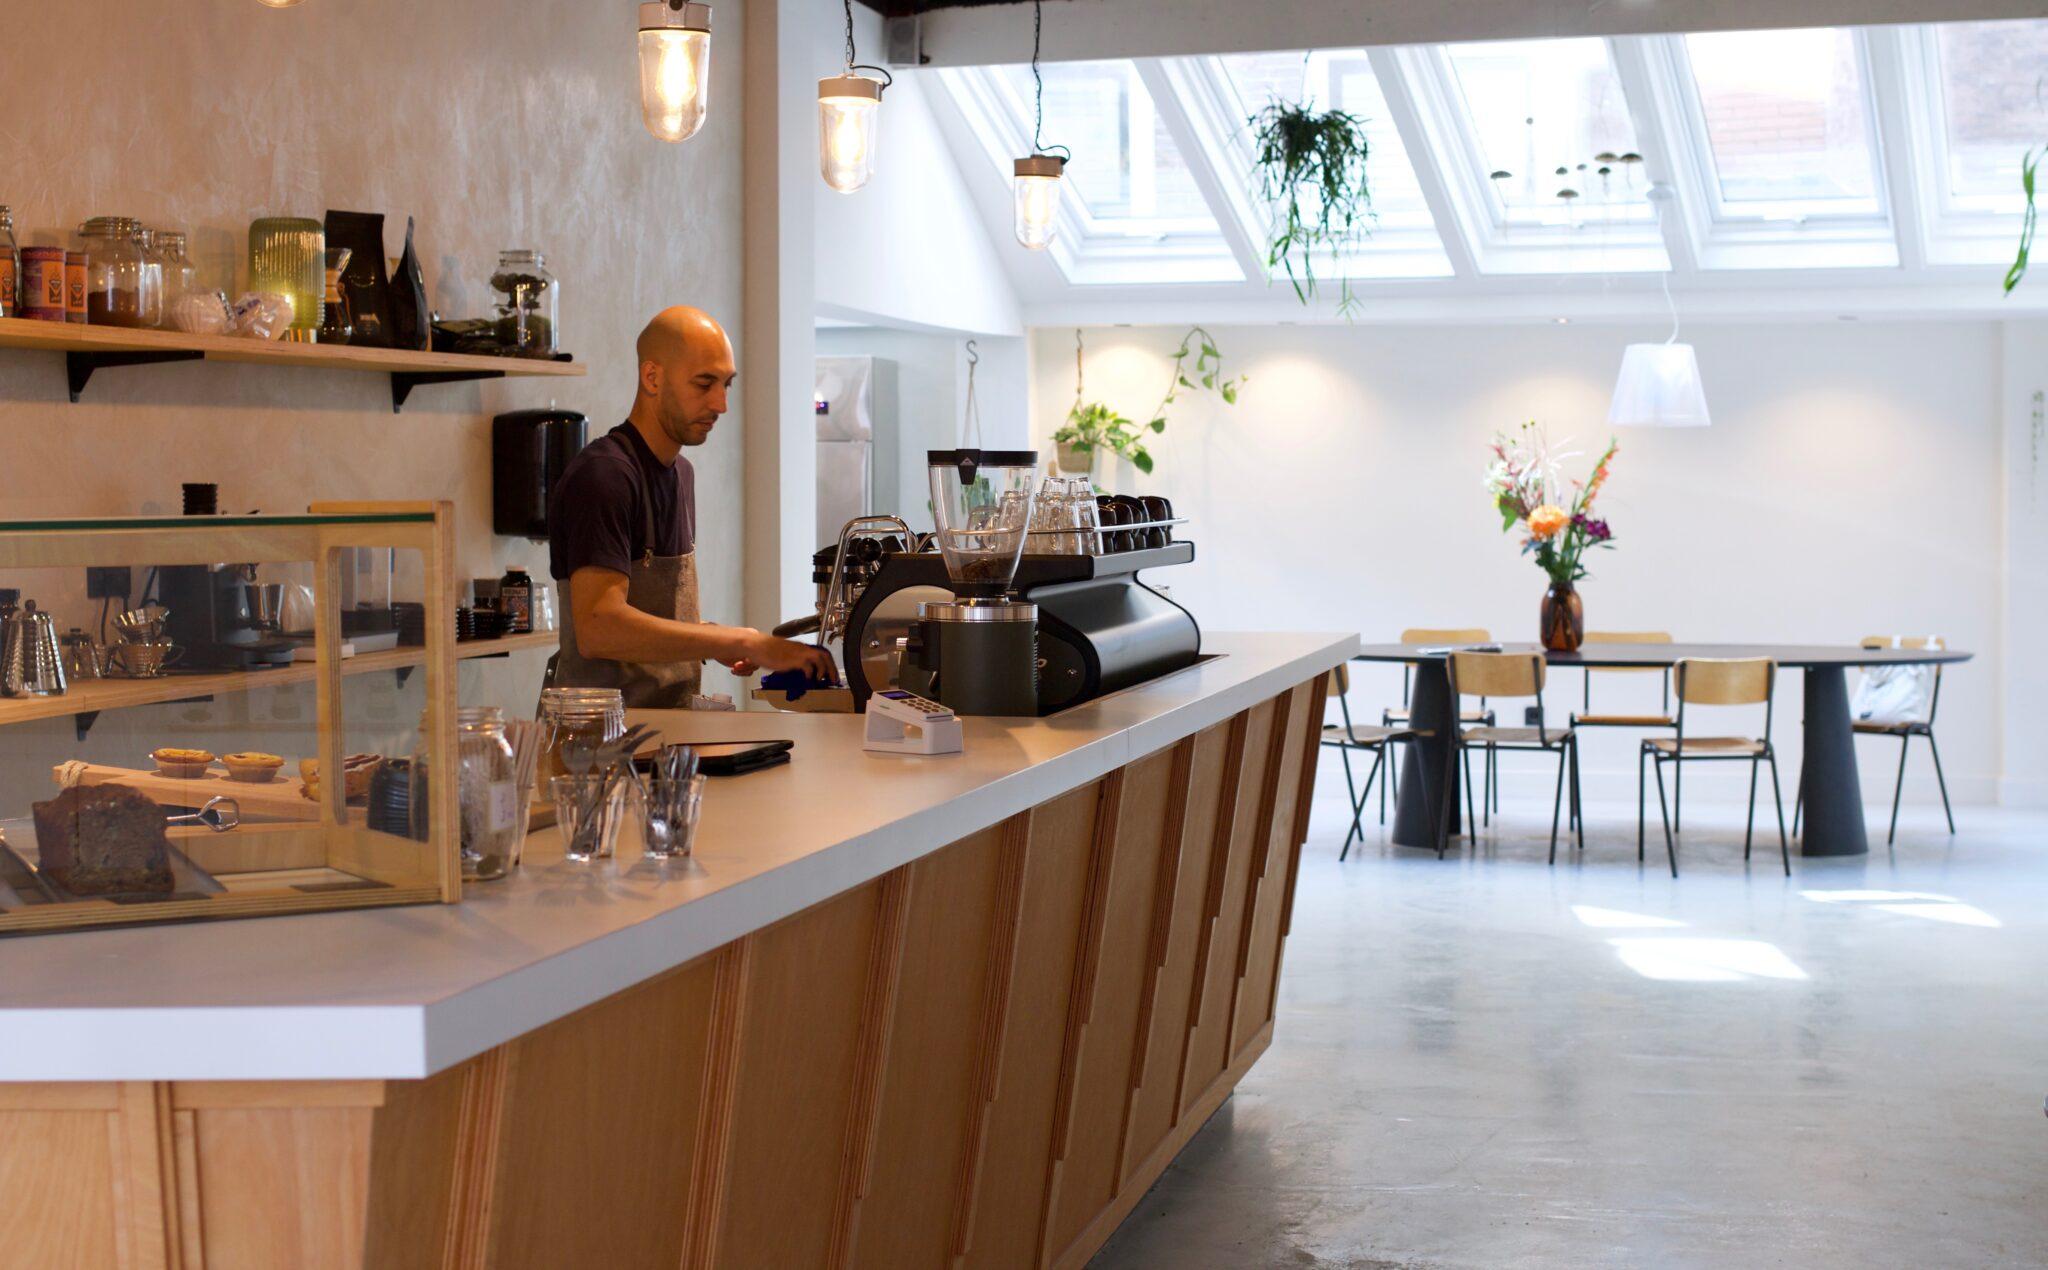 La Maru, koffie, koffiezaak, bakkerij, Haarlem